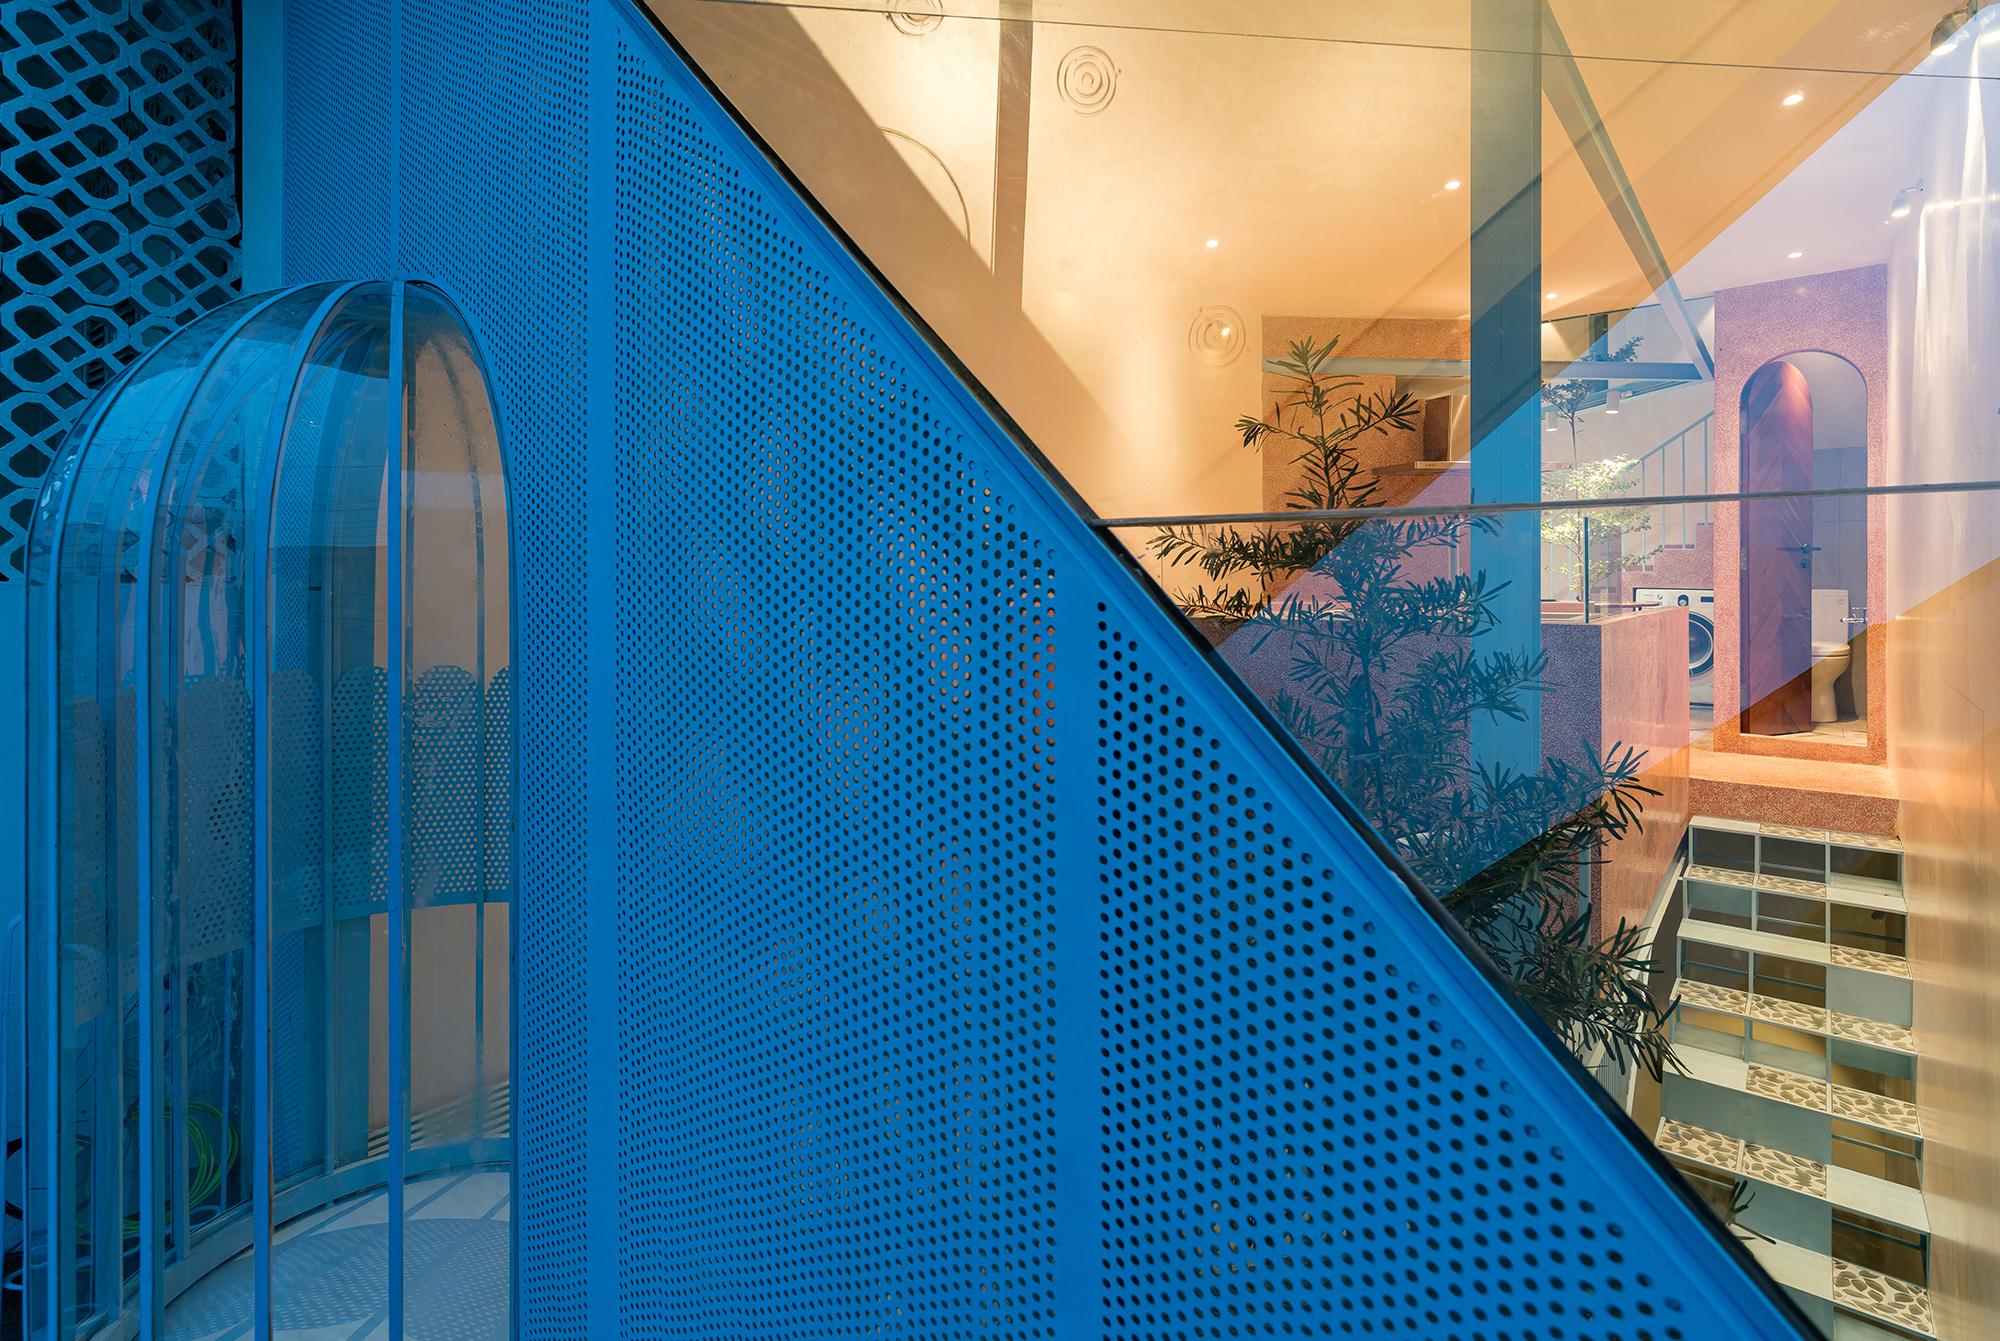 LÂM's home / thiết kế: AD+studio